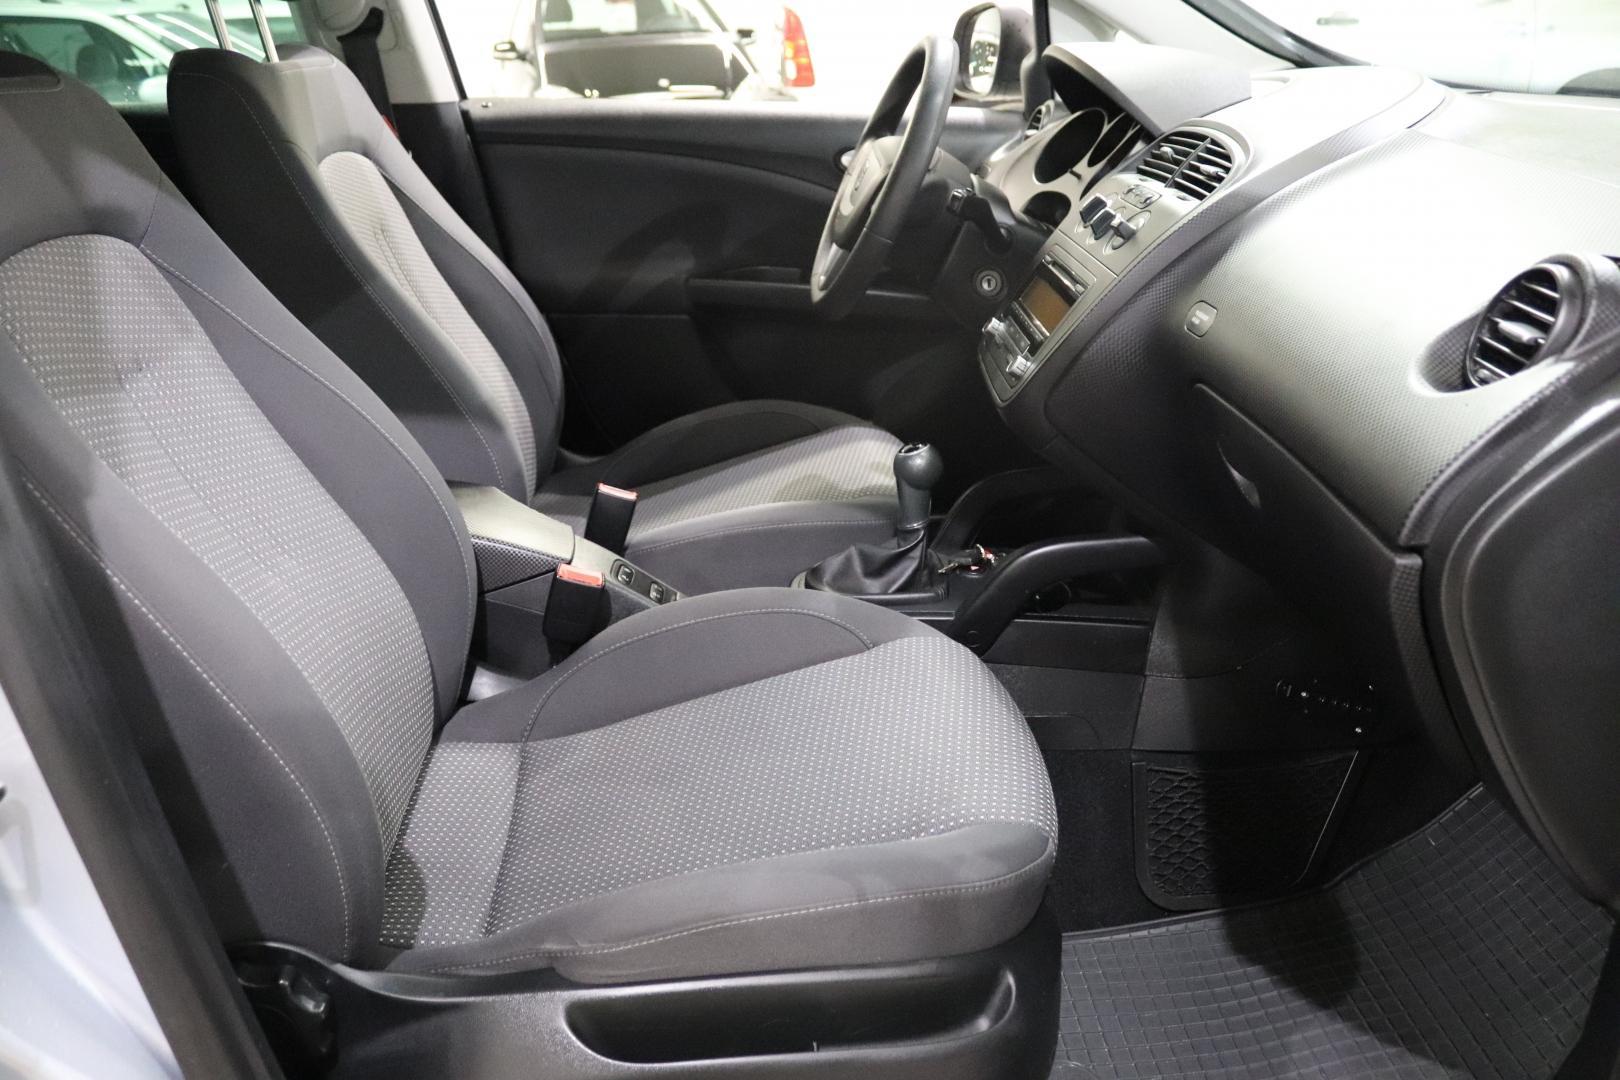 Seat Altea XL, 1,6 TDI DPF CR 60 Años